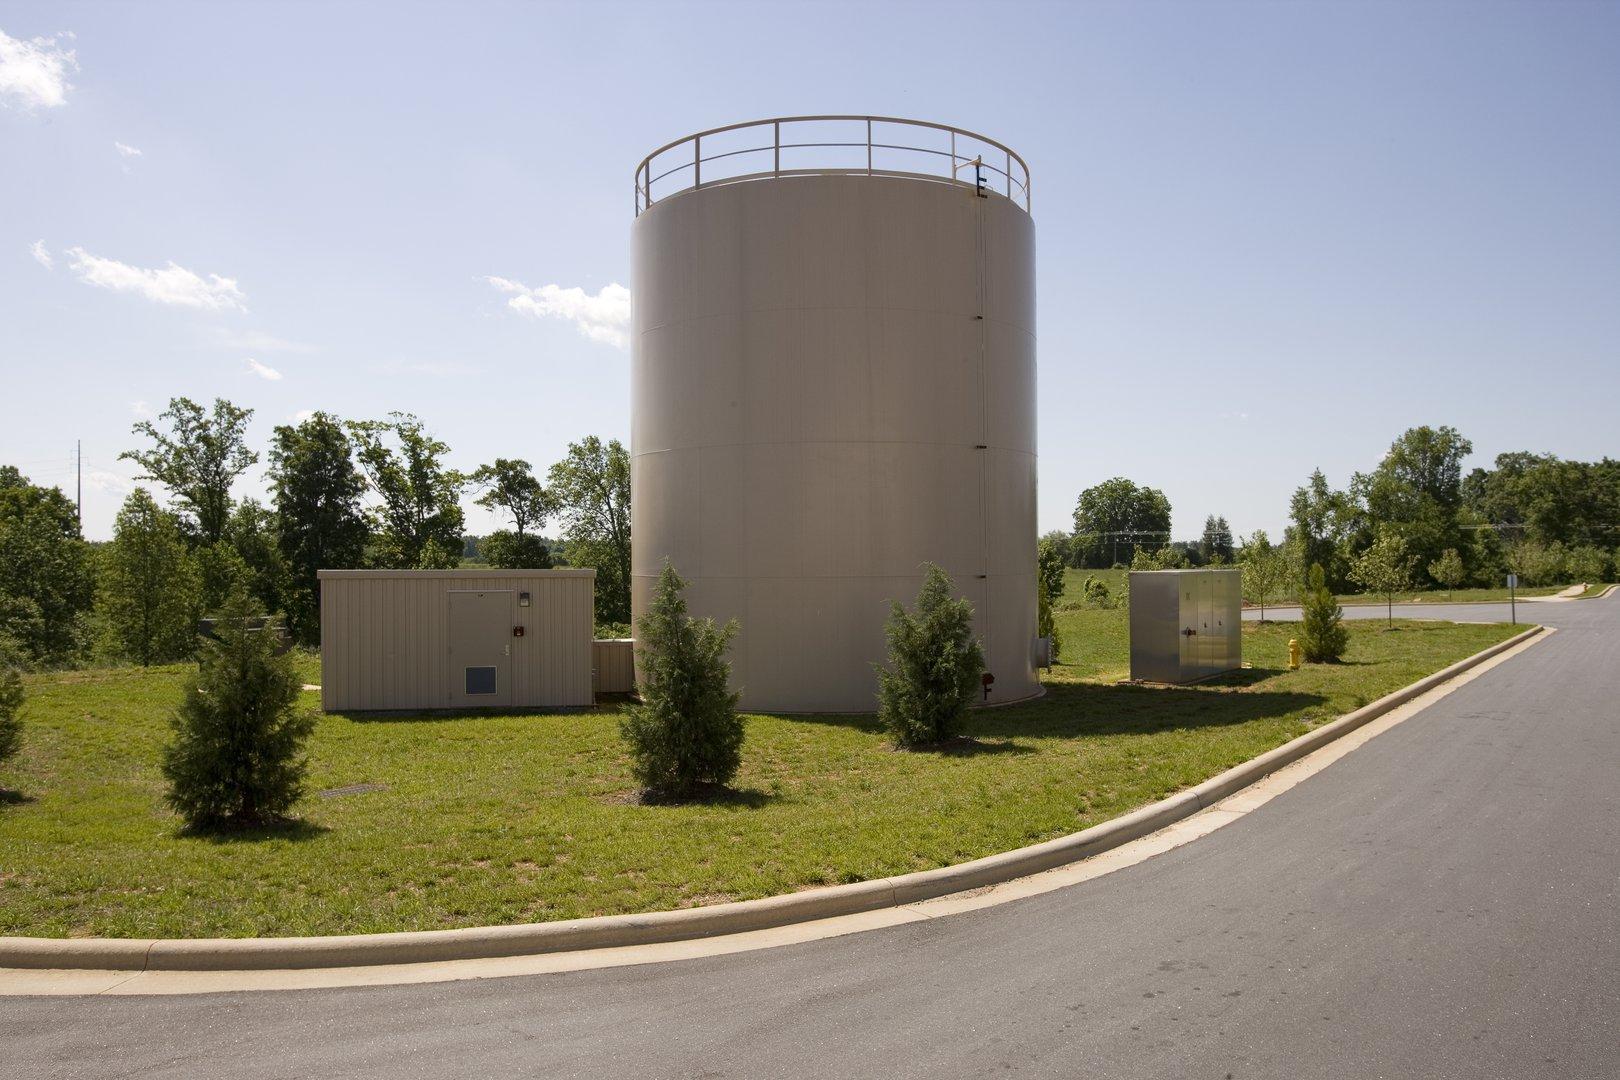 Shurtape Distribution Center Catawba